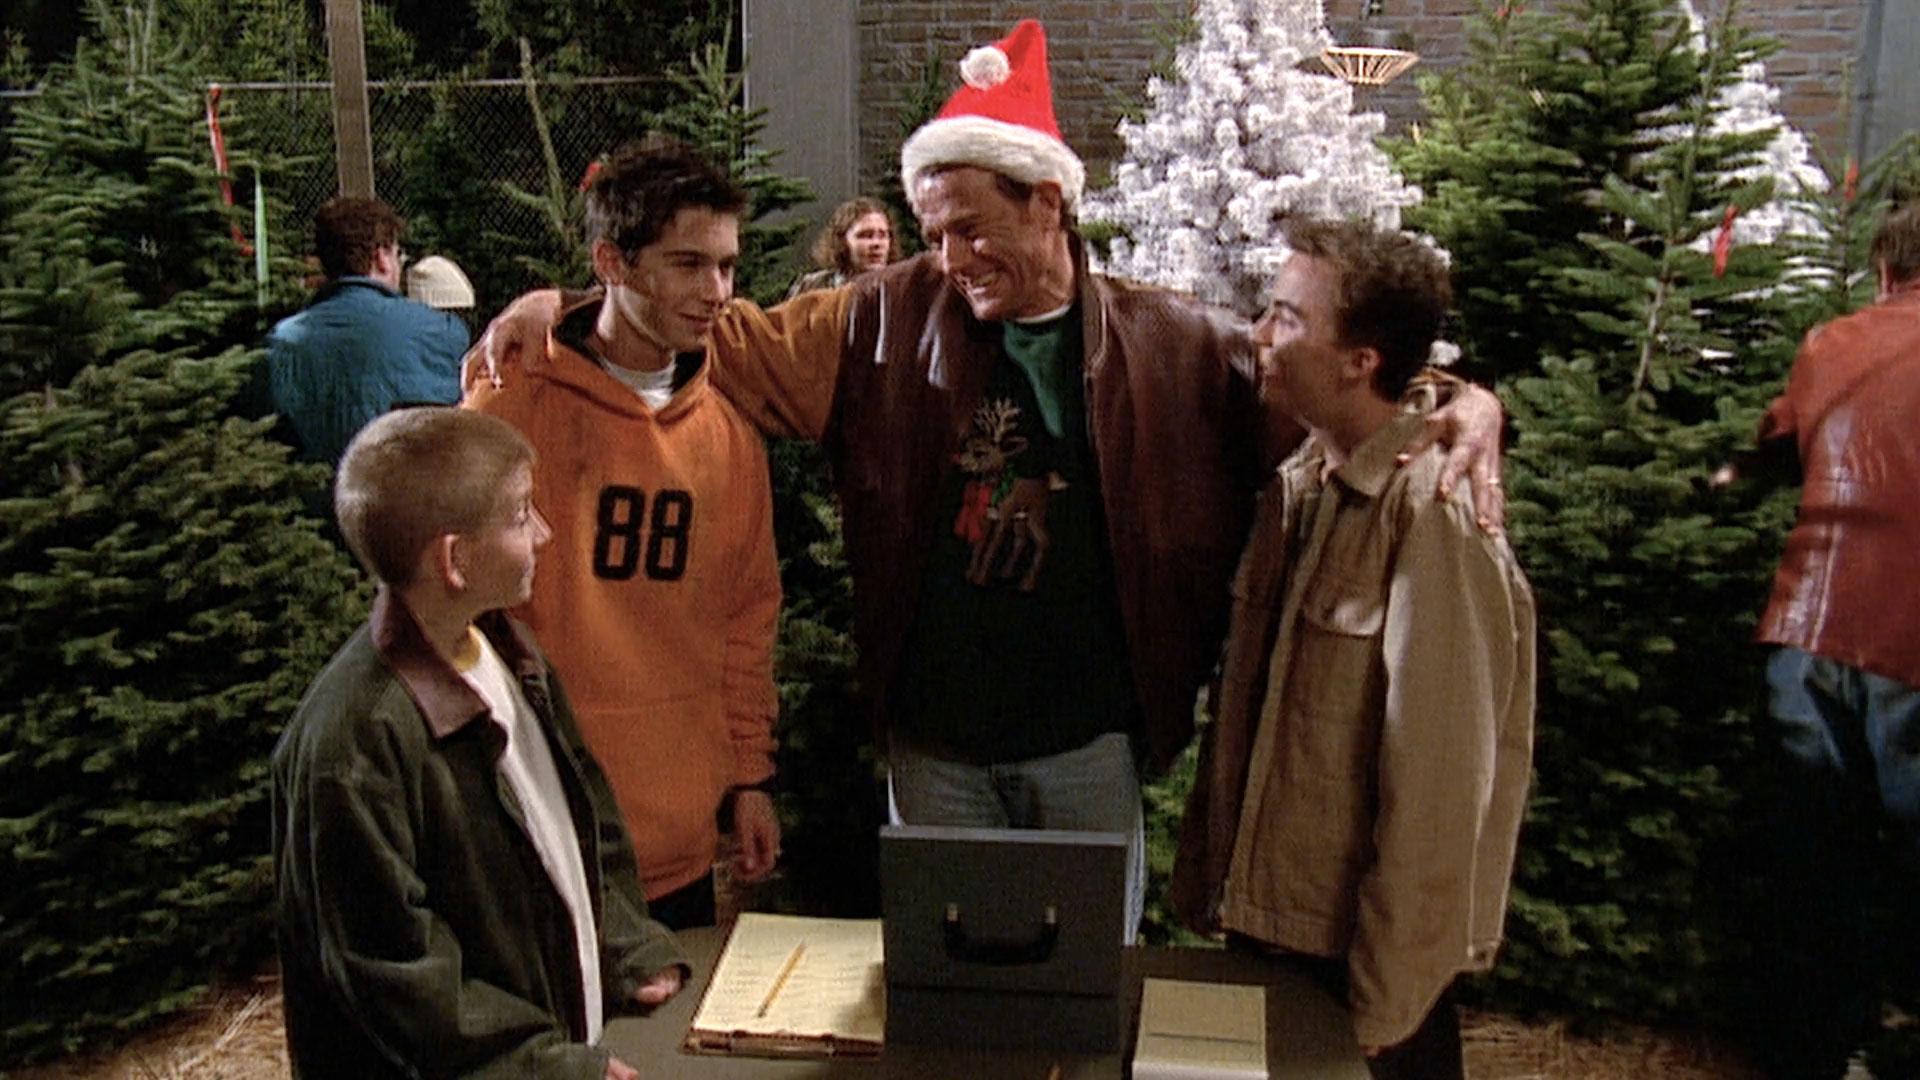 Erik Per Sullivan (Dewey), Justin Berfield (Reese), Bryan Cranston (Hal) et Frankie Muniz (Malcolm) dans